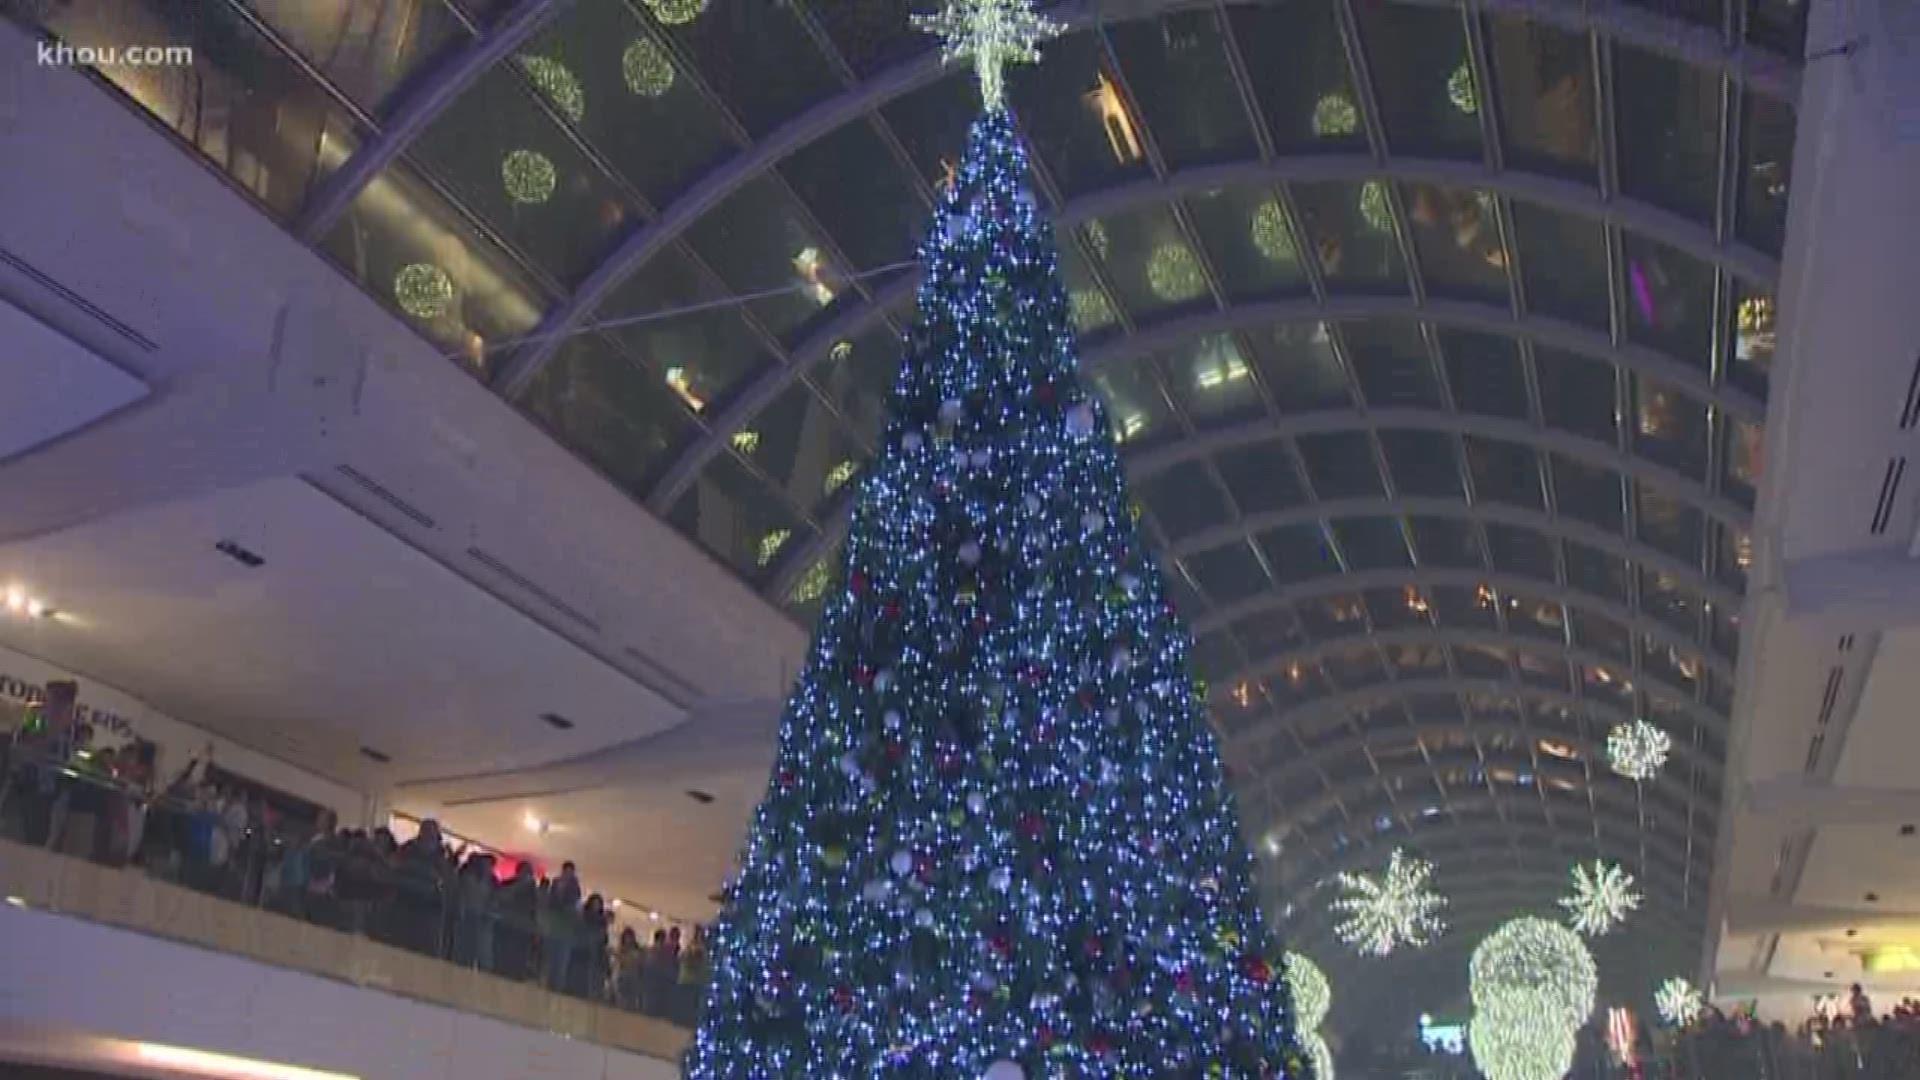 Houston Galleria Christmas Tree Lighting 2020 Houston Galleria lights up for Christmas | khou.com